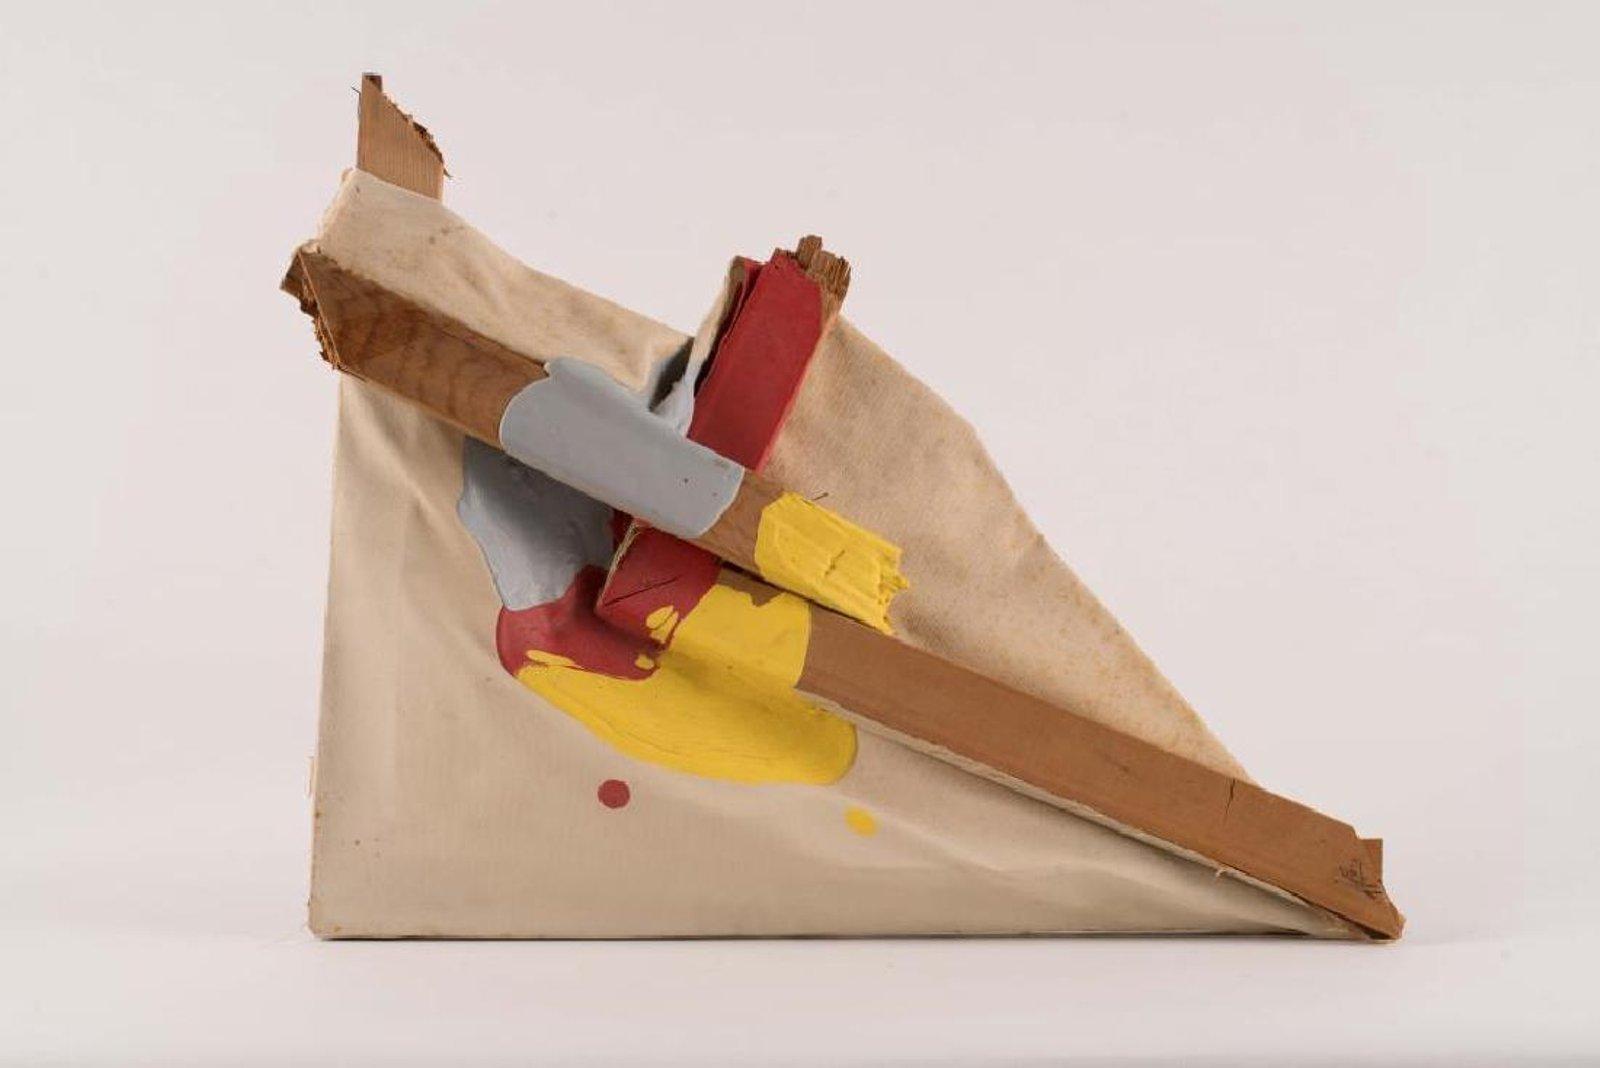 "Warhol, signé ""Jon / Andy Warhol '83"", intitulé Abstraction - Un cadeau à Jon Gould Estimation: 500 000 - 1 million de dollars"